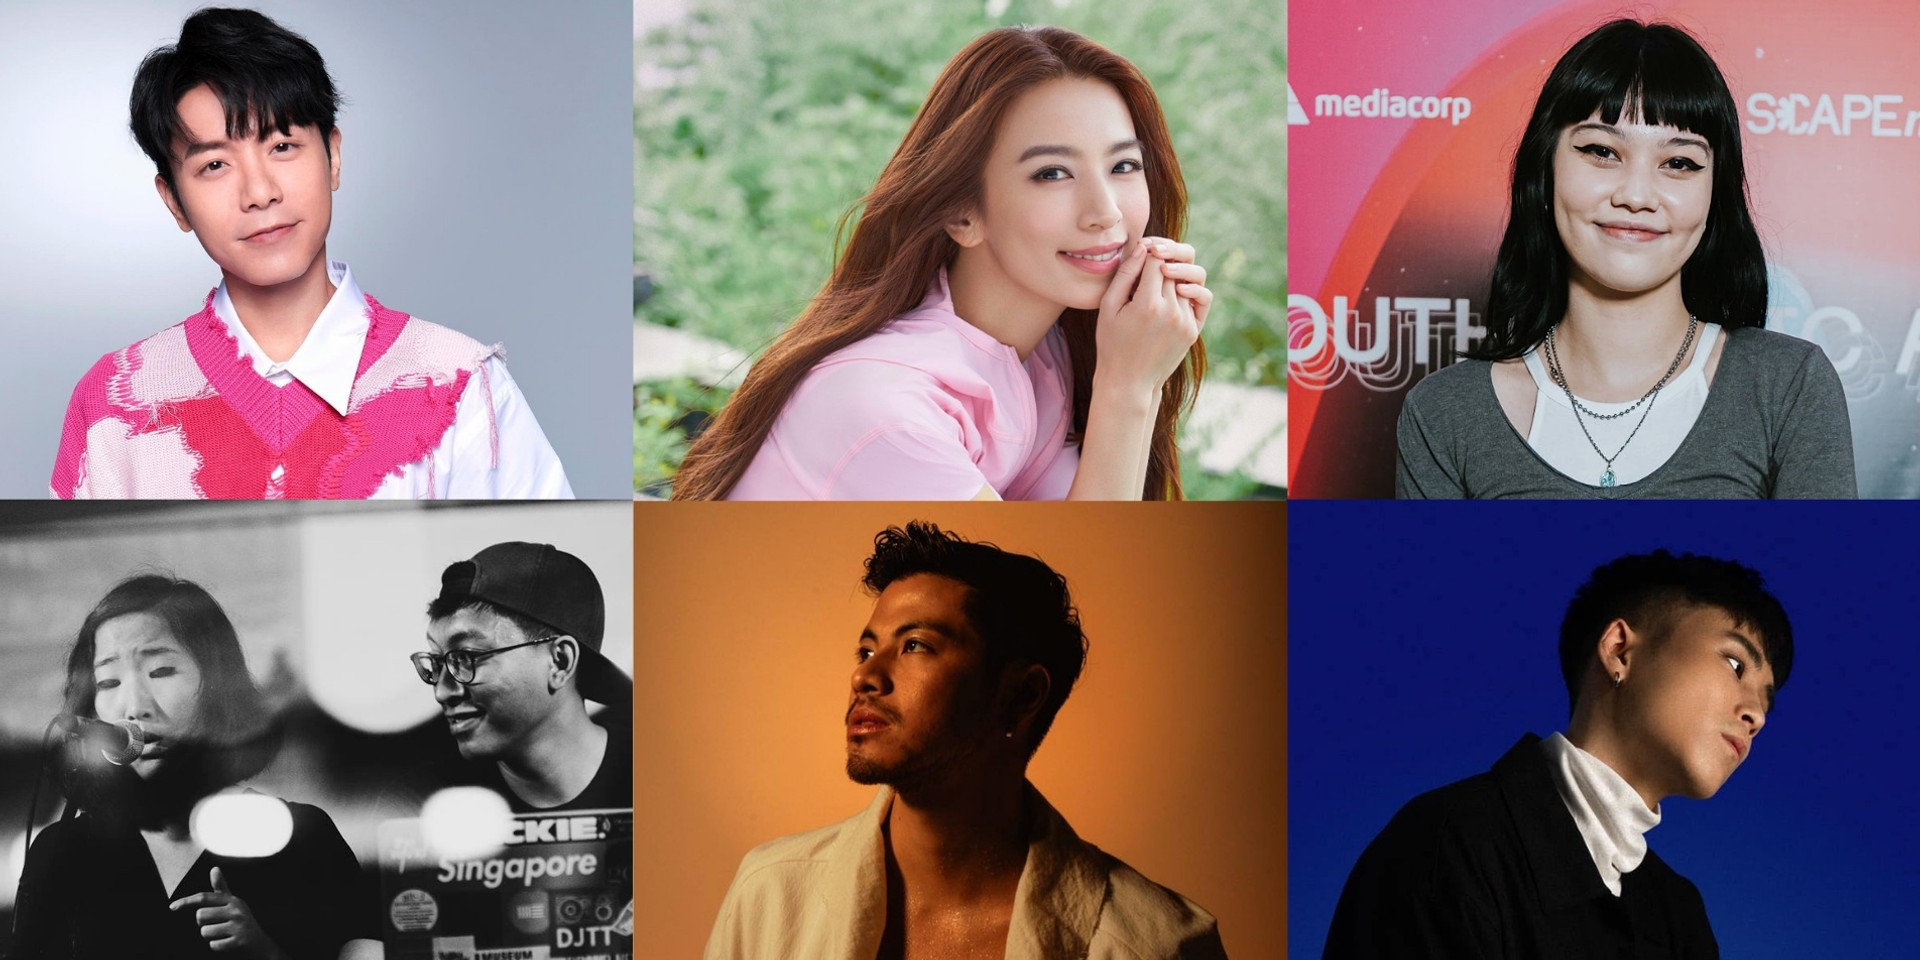 Here are the nominees of the 14th Freshmusic Awards — Benjamin Kheng, Hebe Tien, WeiBird, Shye, .gif, Ryota Katayama, and more